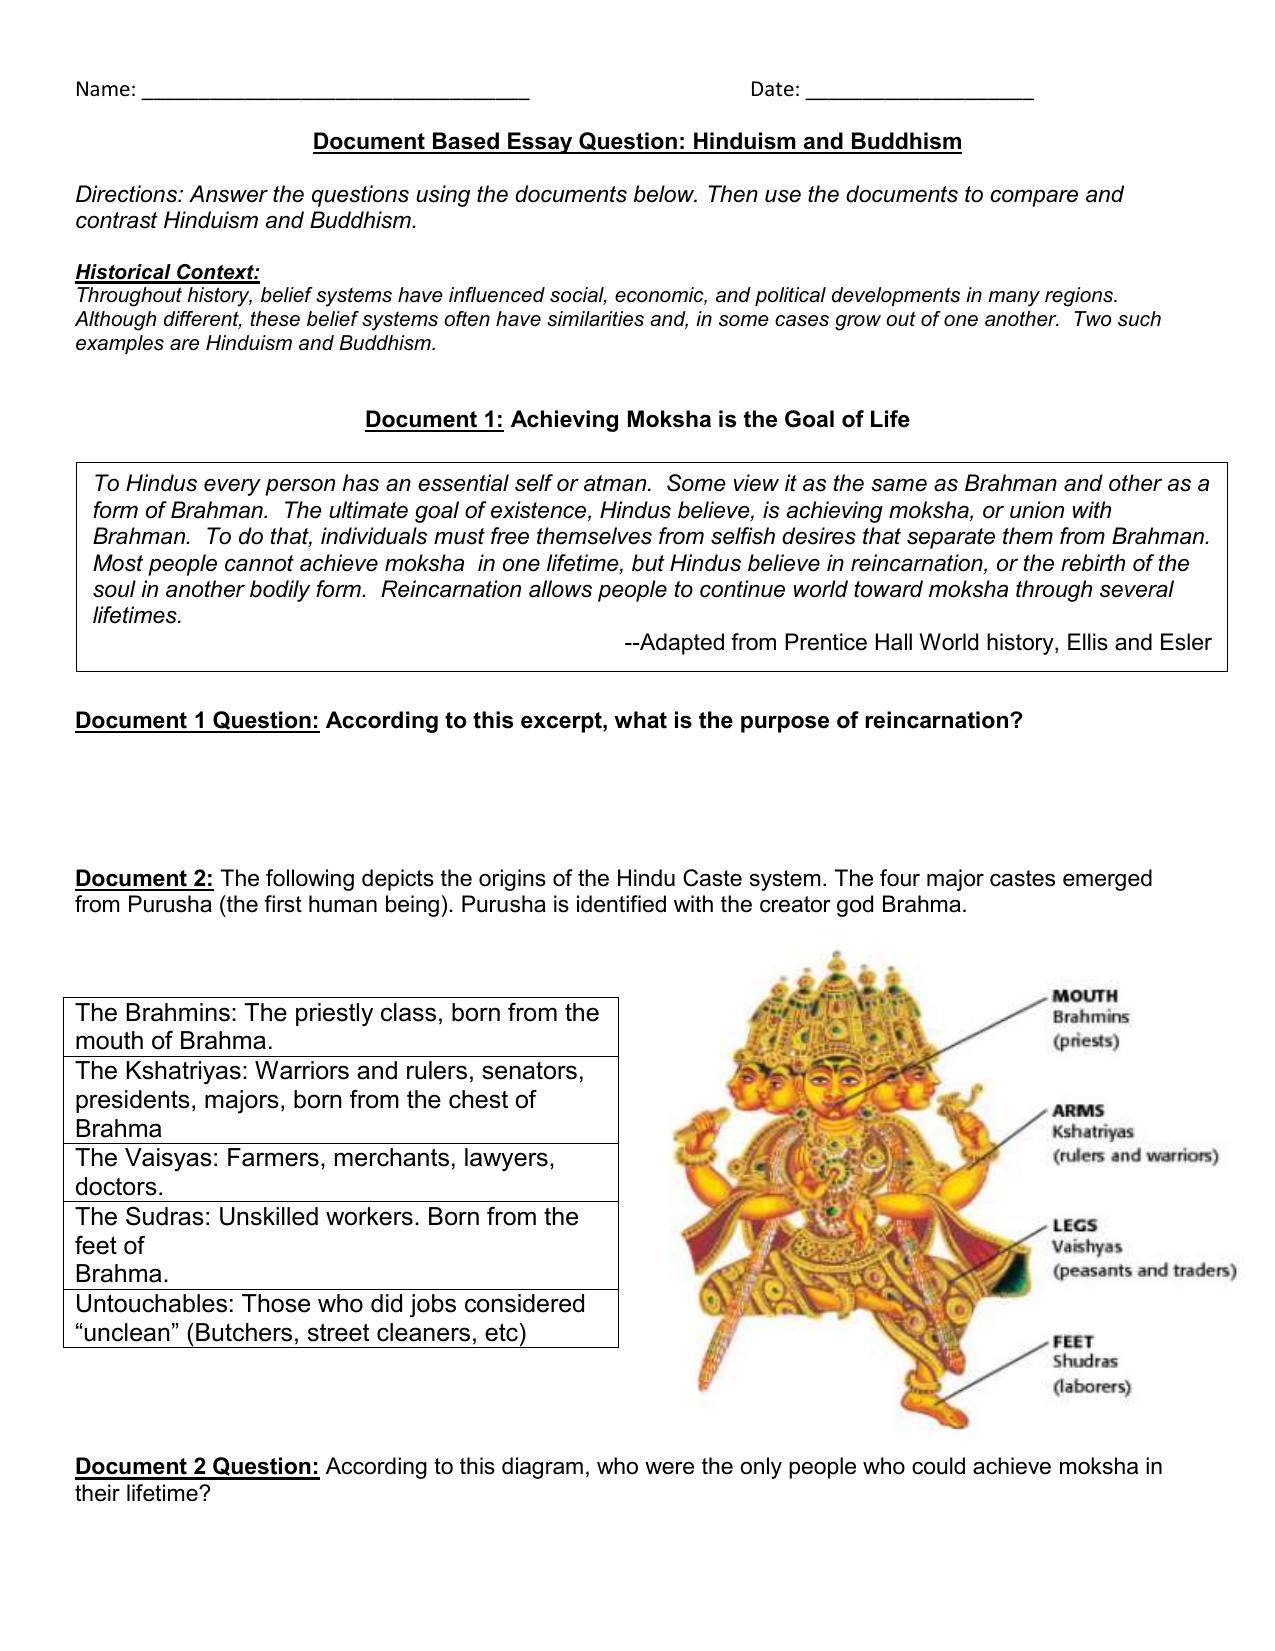 006 009328677 1 Essay Example Surprising Hinduism Questions Hindu Muslim Ekta In Hindi And Buddhism Introduction Full